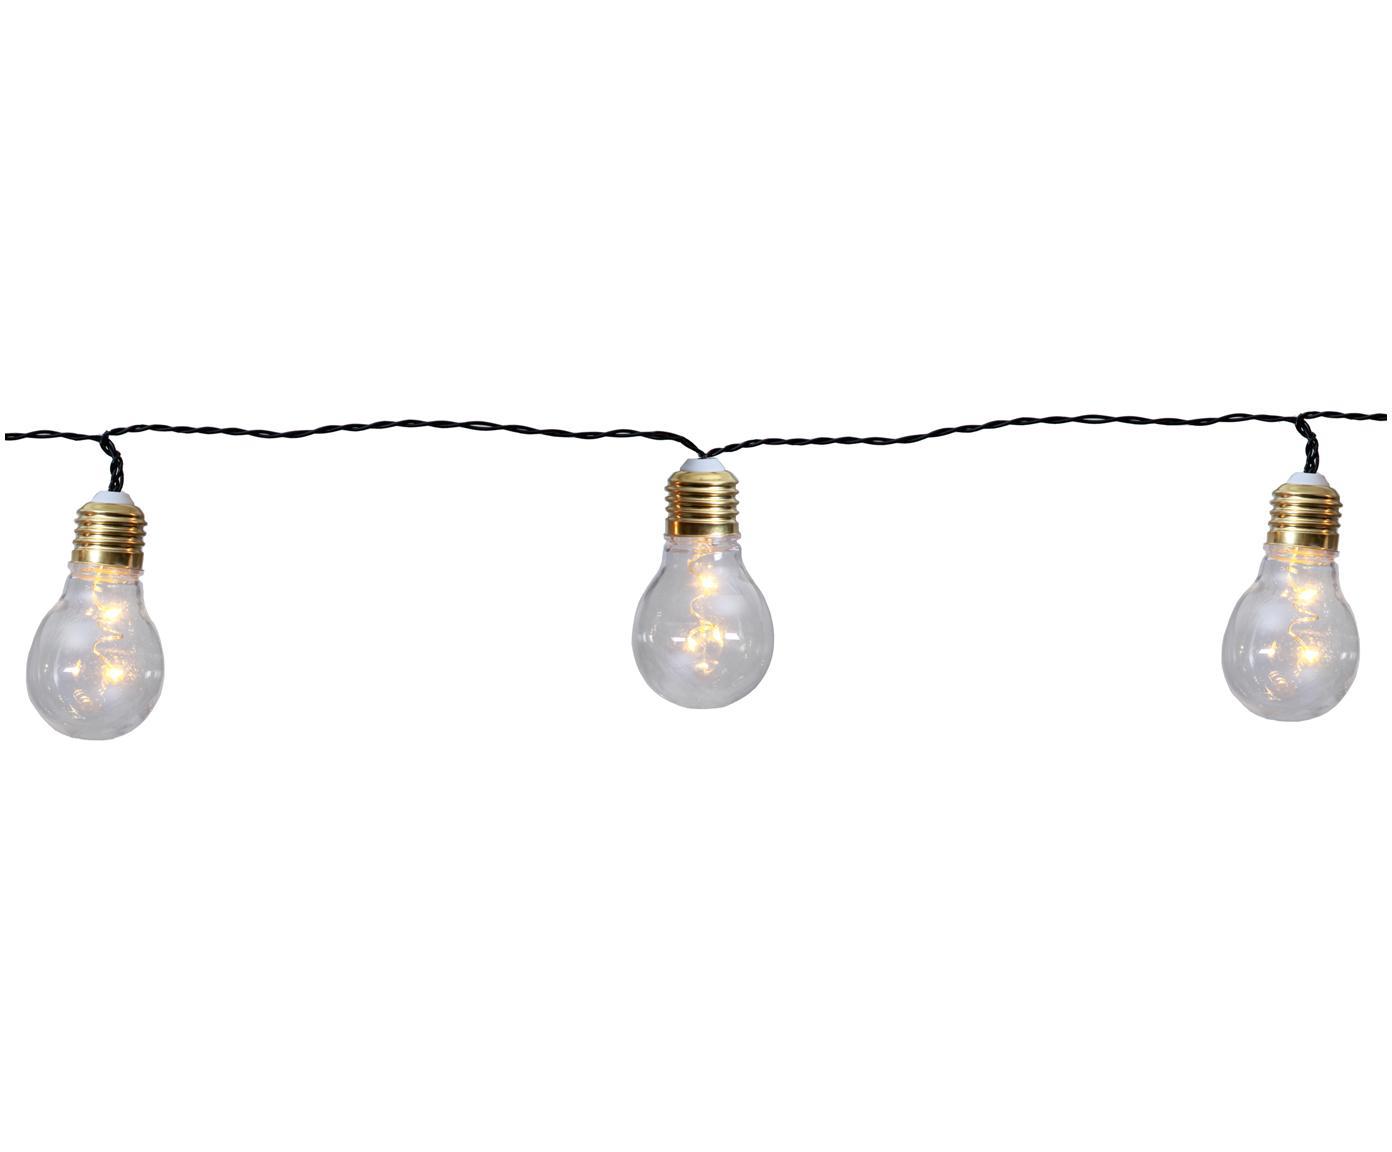 Ghirlanda a LED Bulb, 100 cm, Lampadina: trasparente, dorato Cavo: nero, Lung. 100 cm